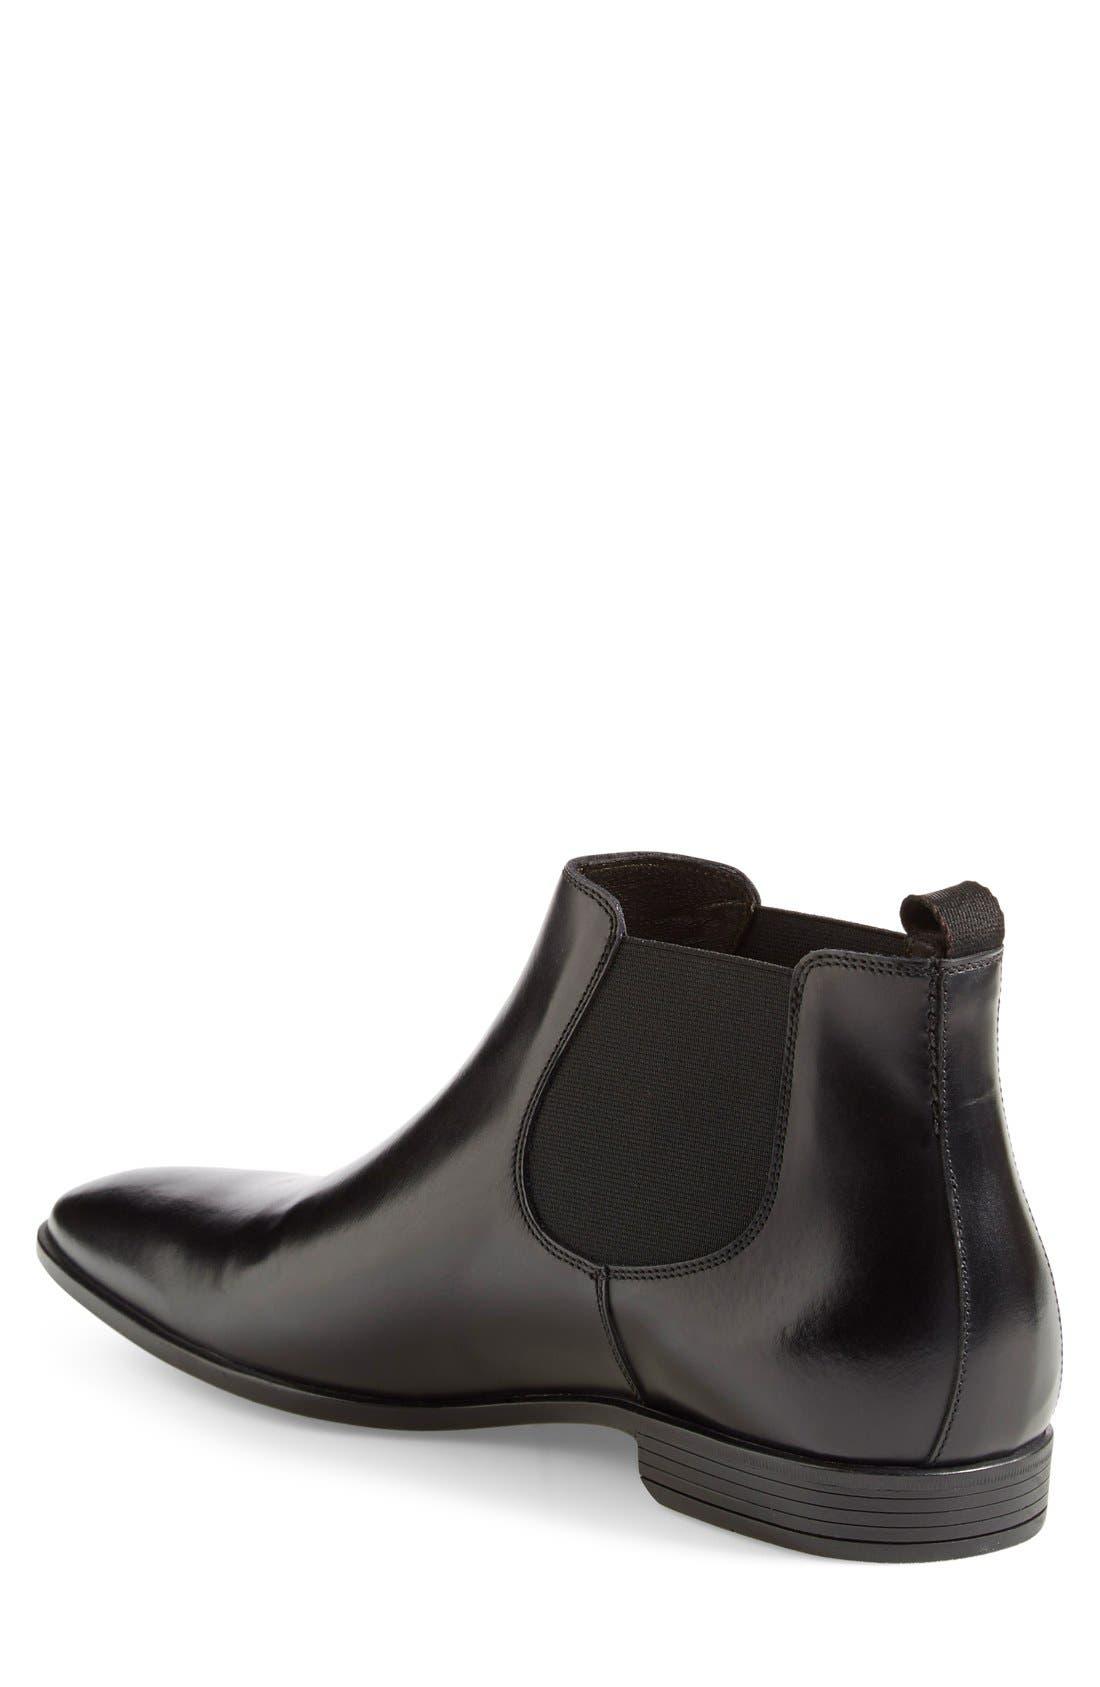 'Canton' Chelsea Boot,                             Alternate thumbnail 2, color,                             Black